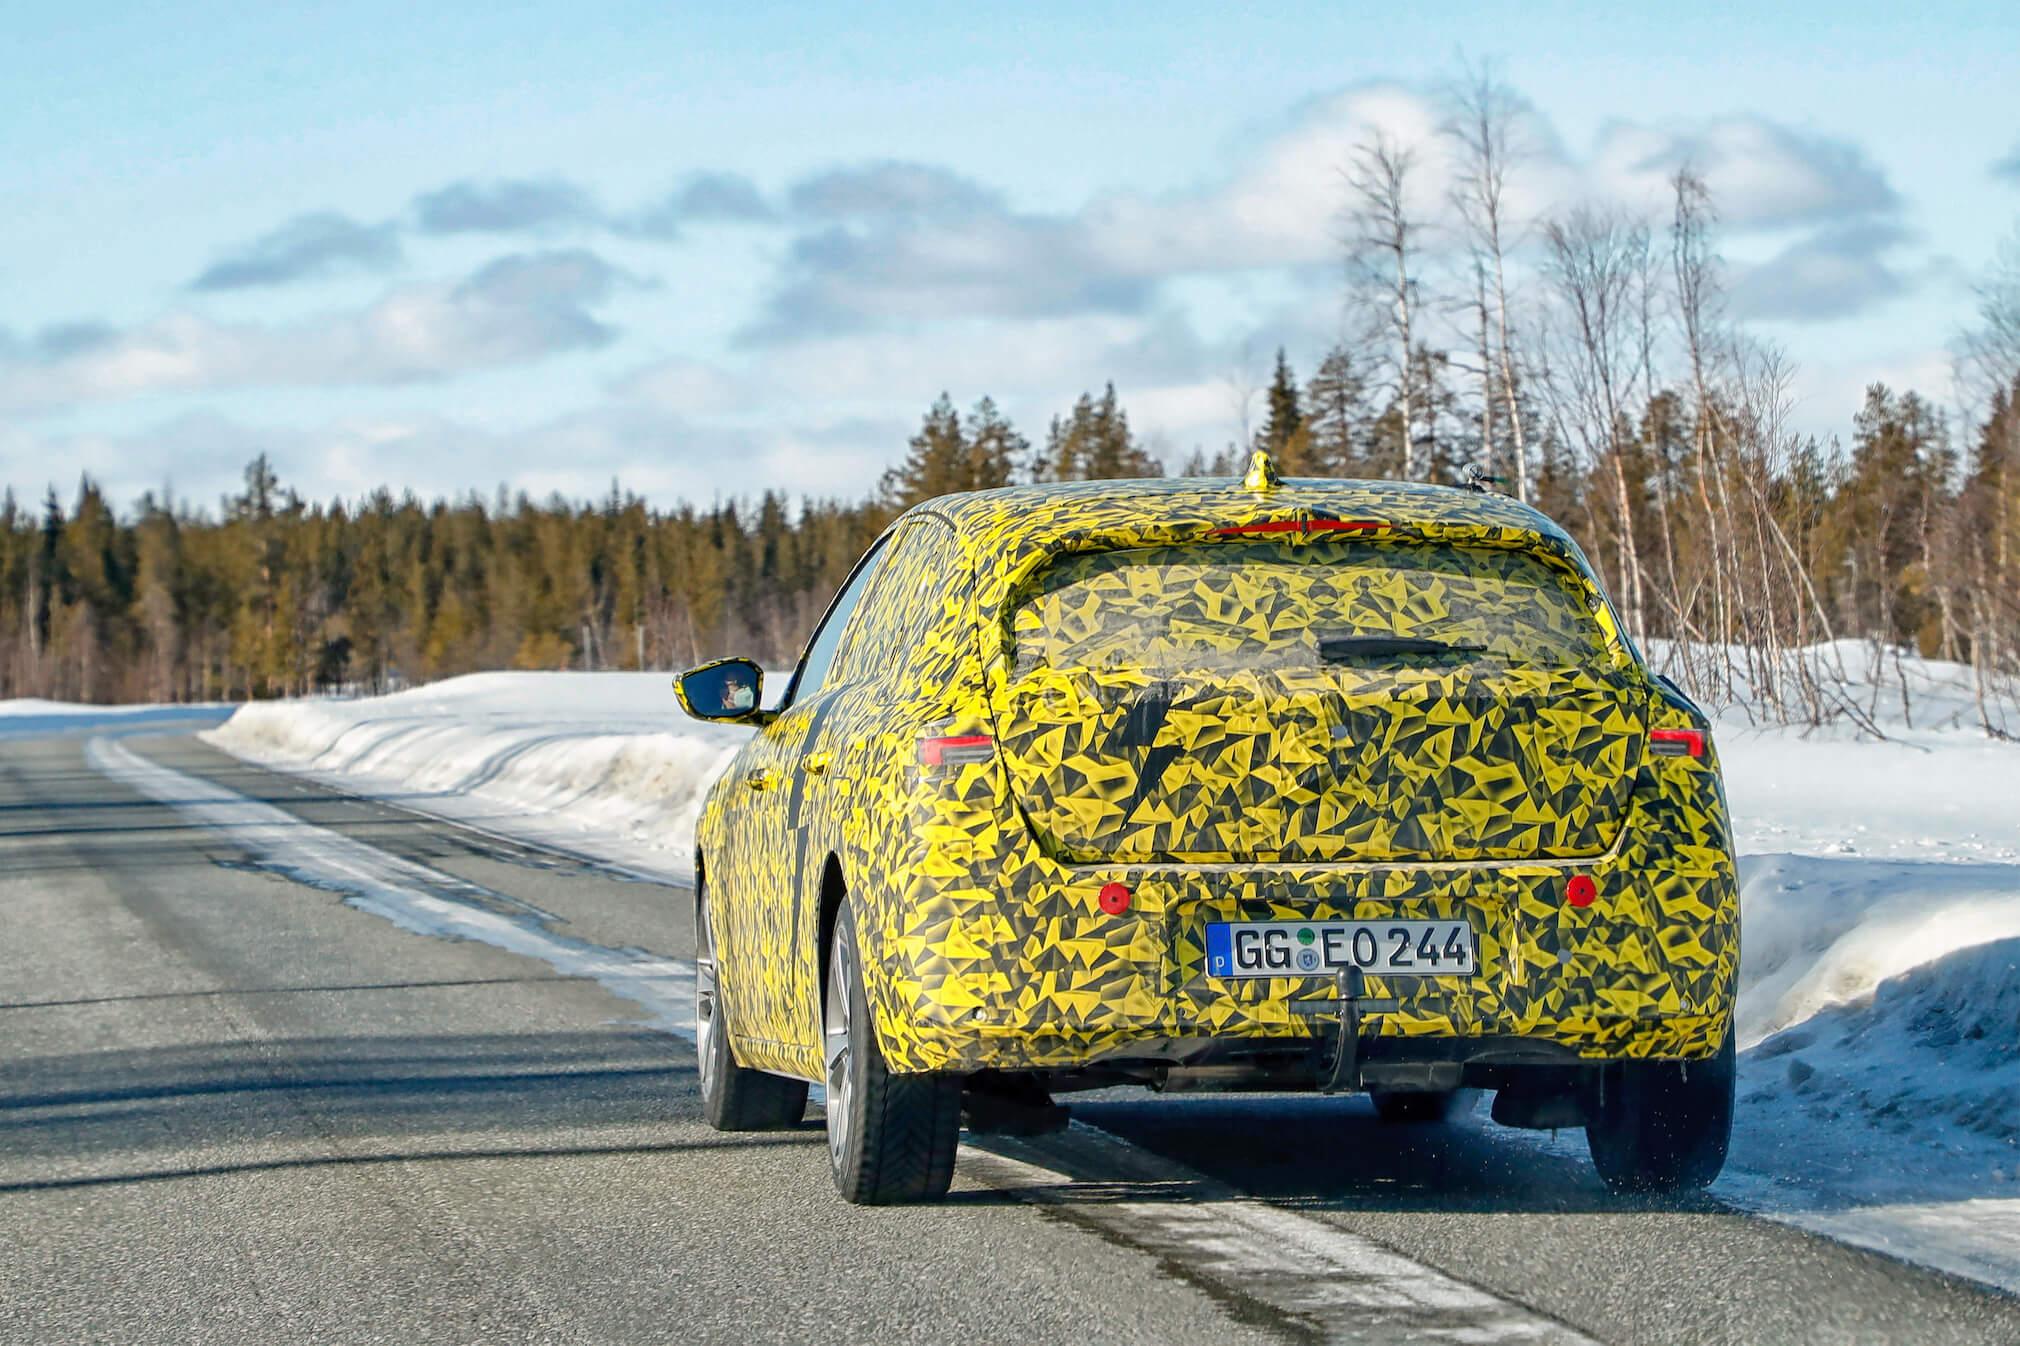 Opel-Astra 5